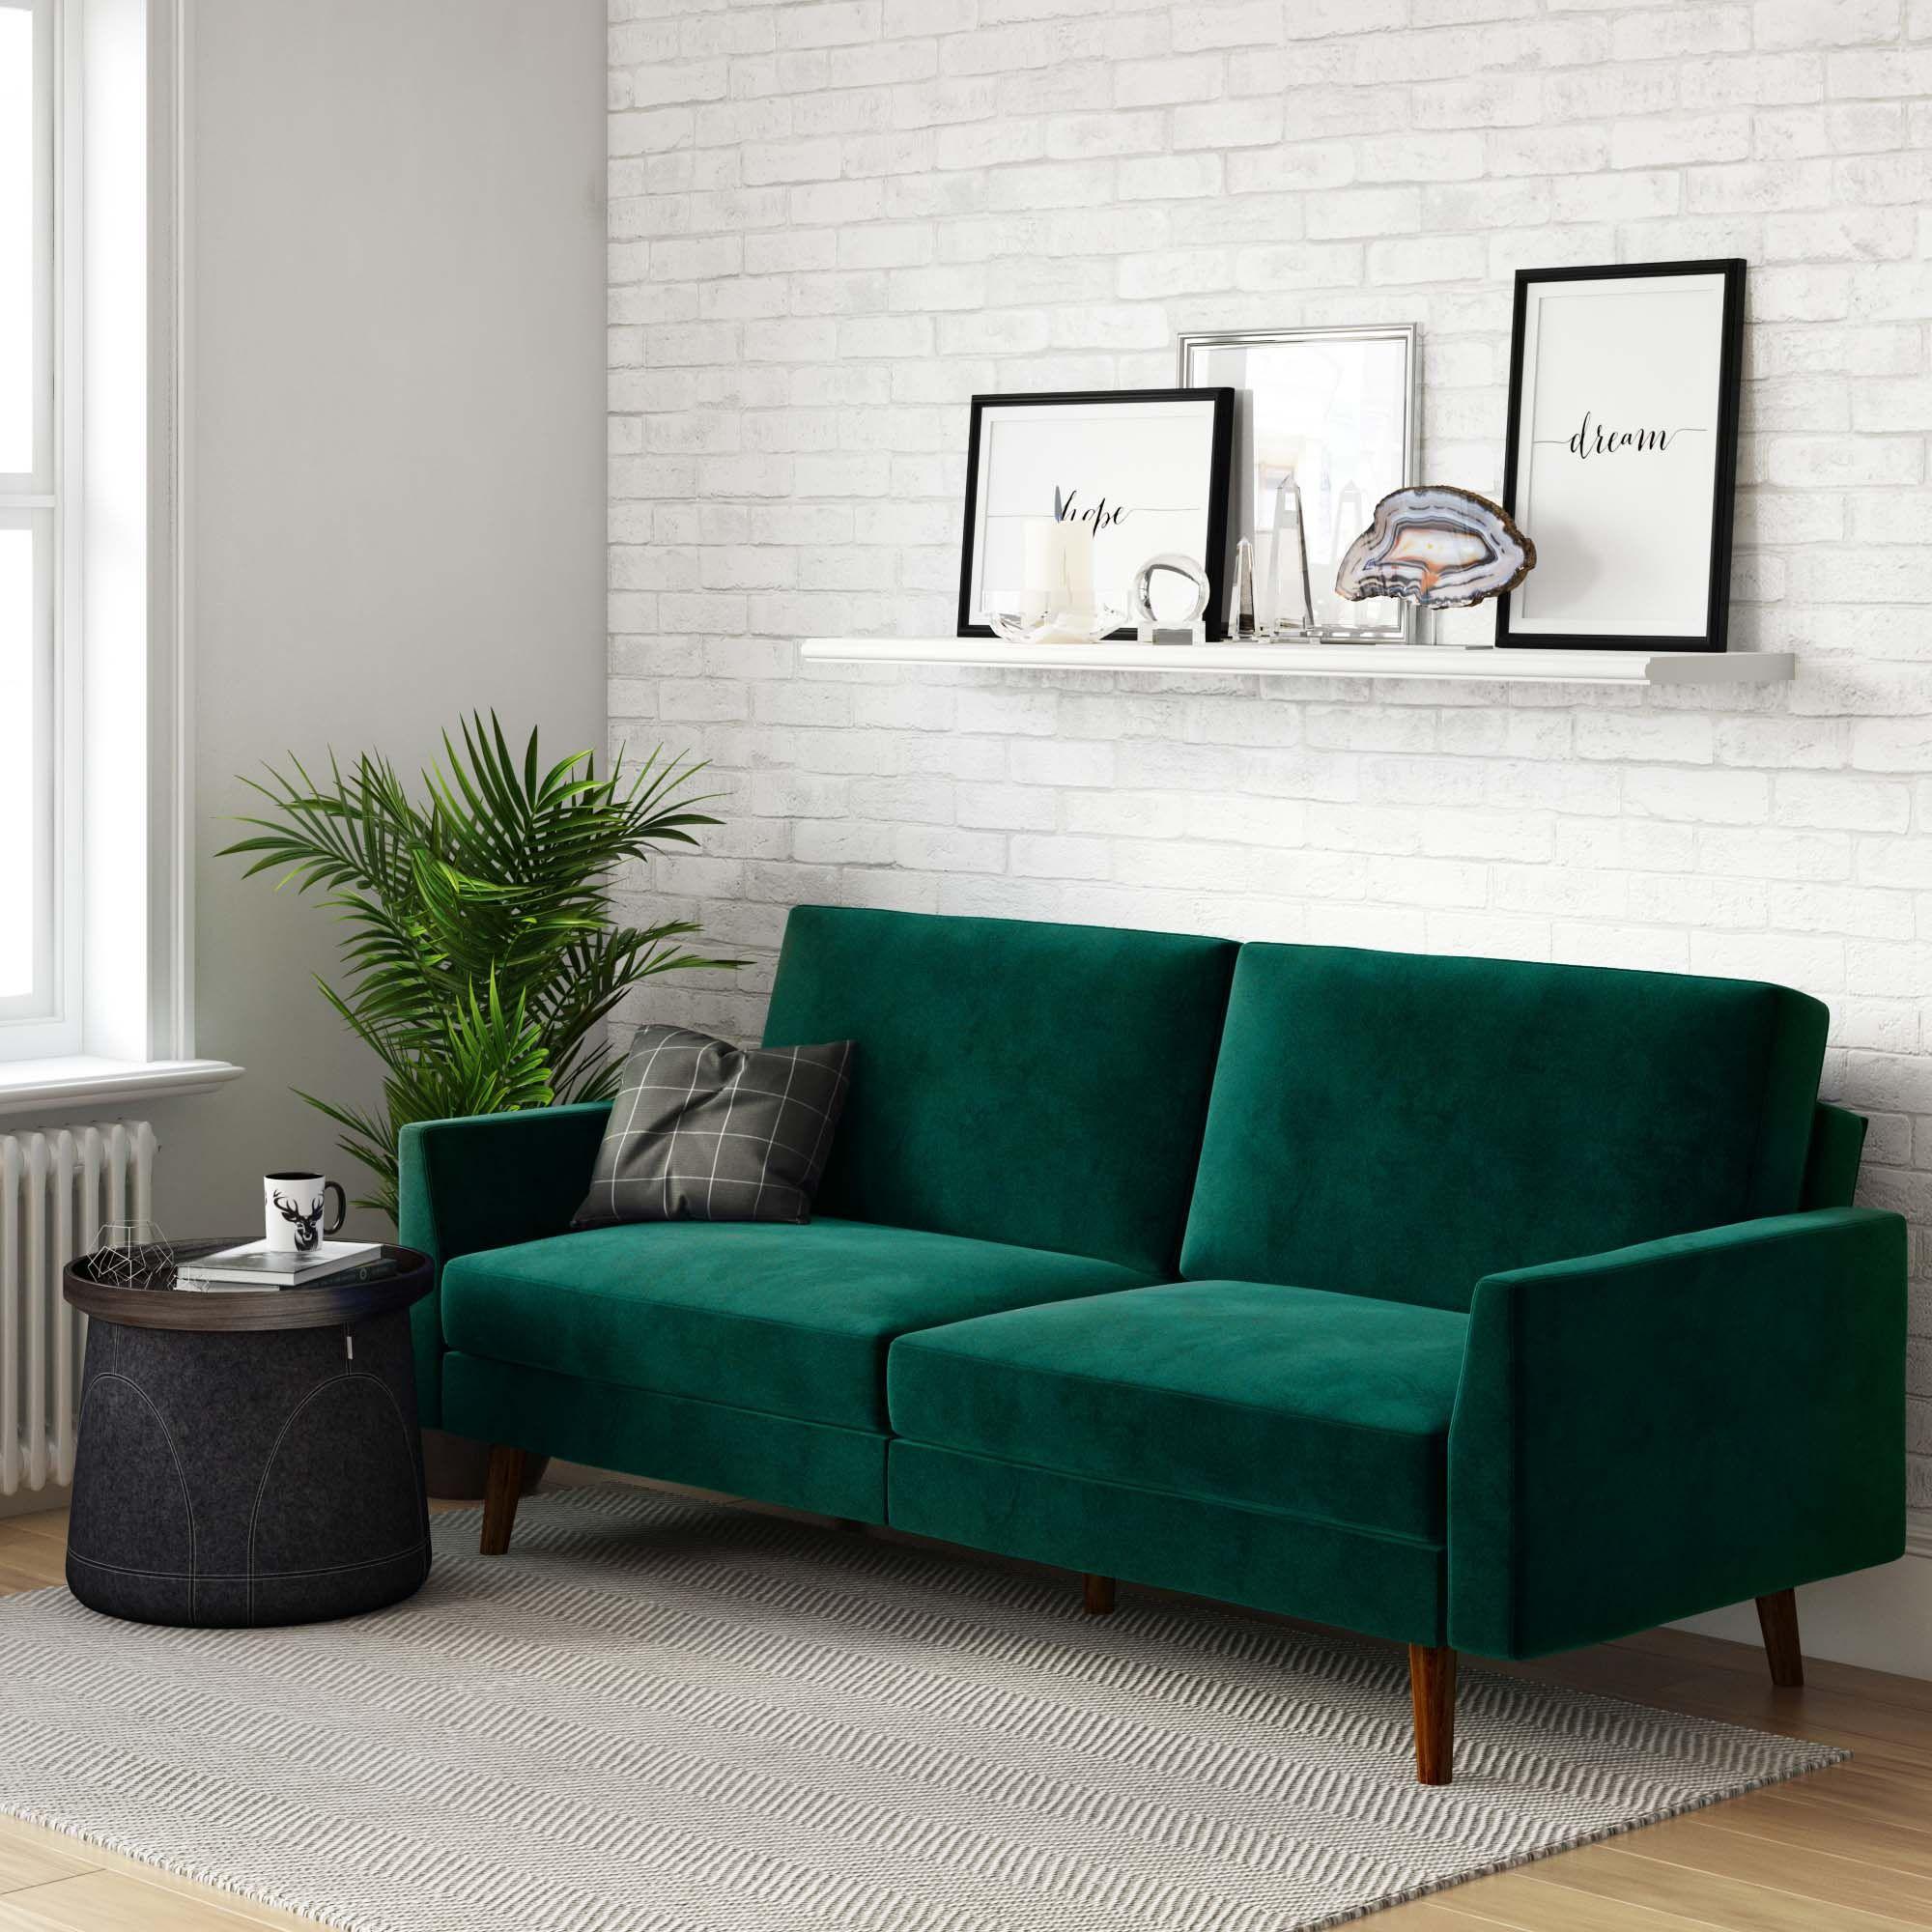 Home Sofa Convertible Sofa Bed